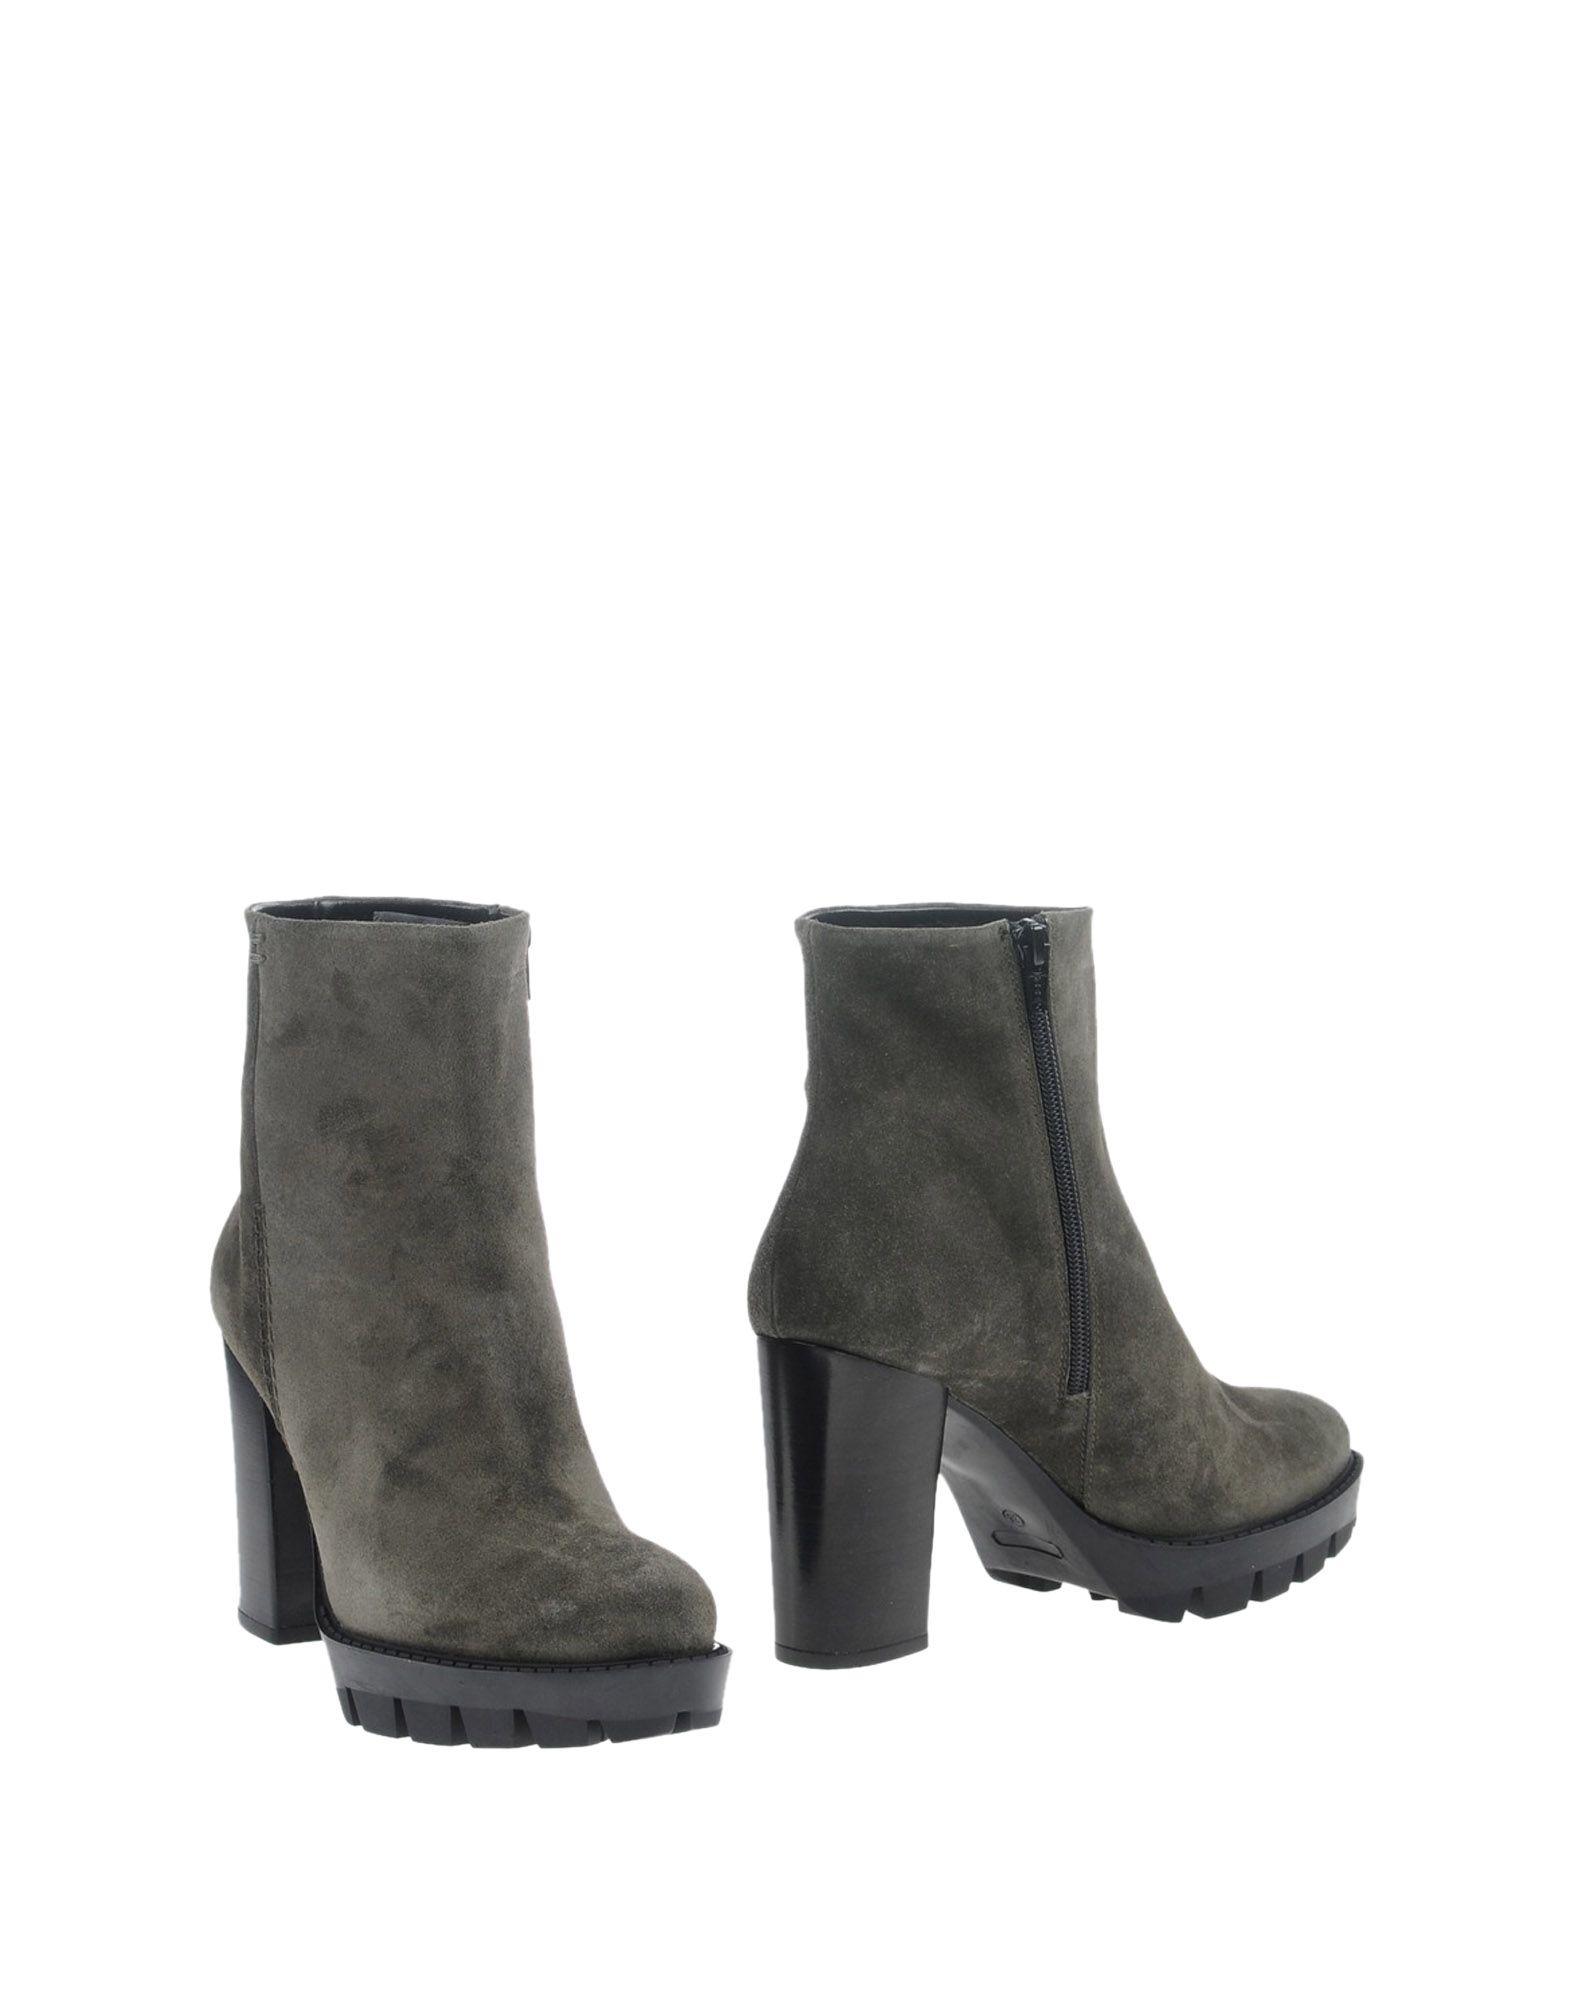 Pons Quintana Stiefelette Damen  11254151SJ Gute Qualität beliebte Schuhe